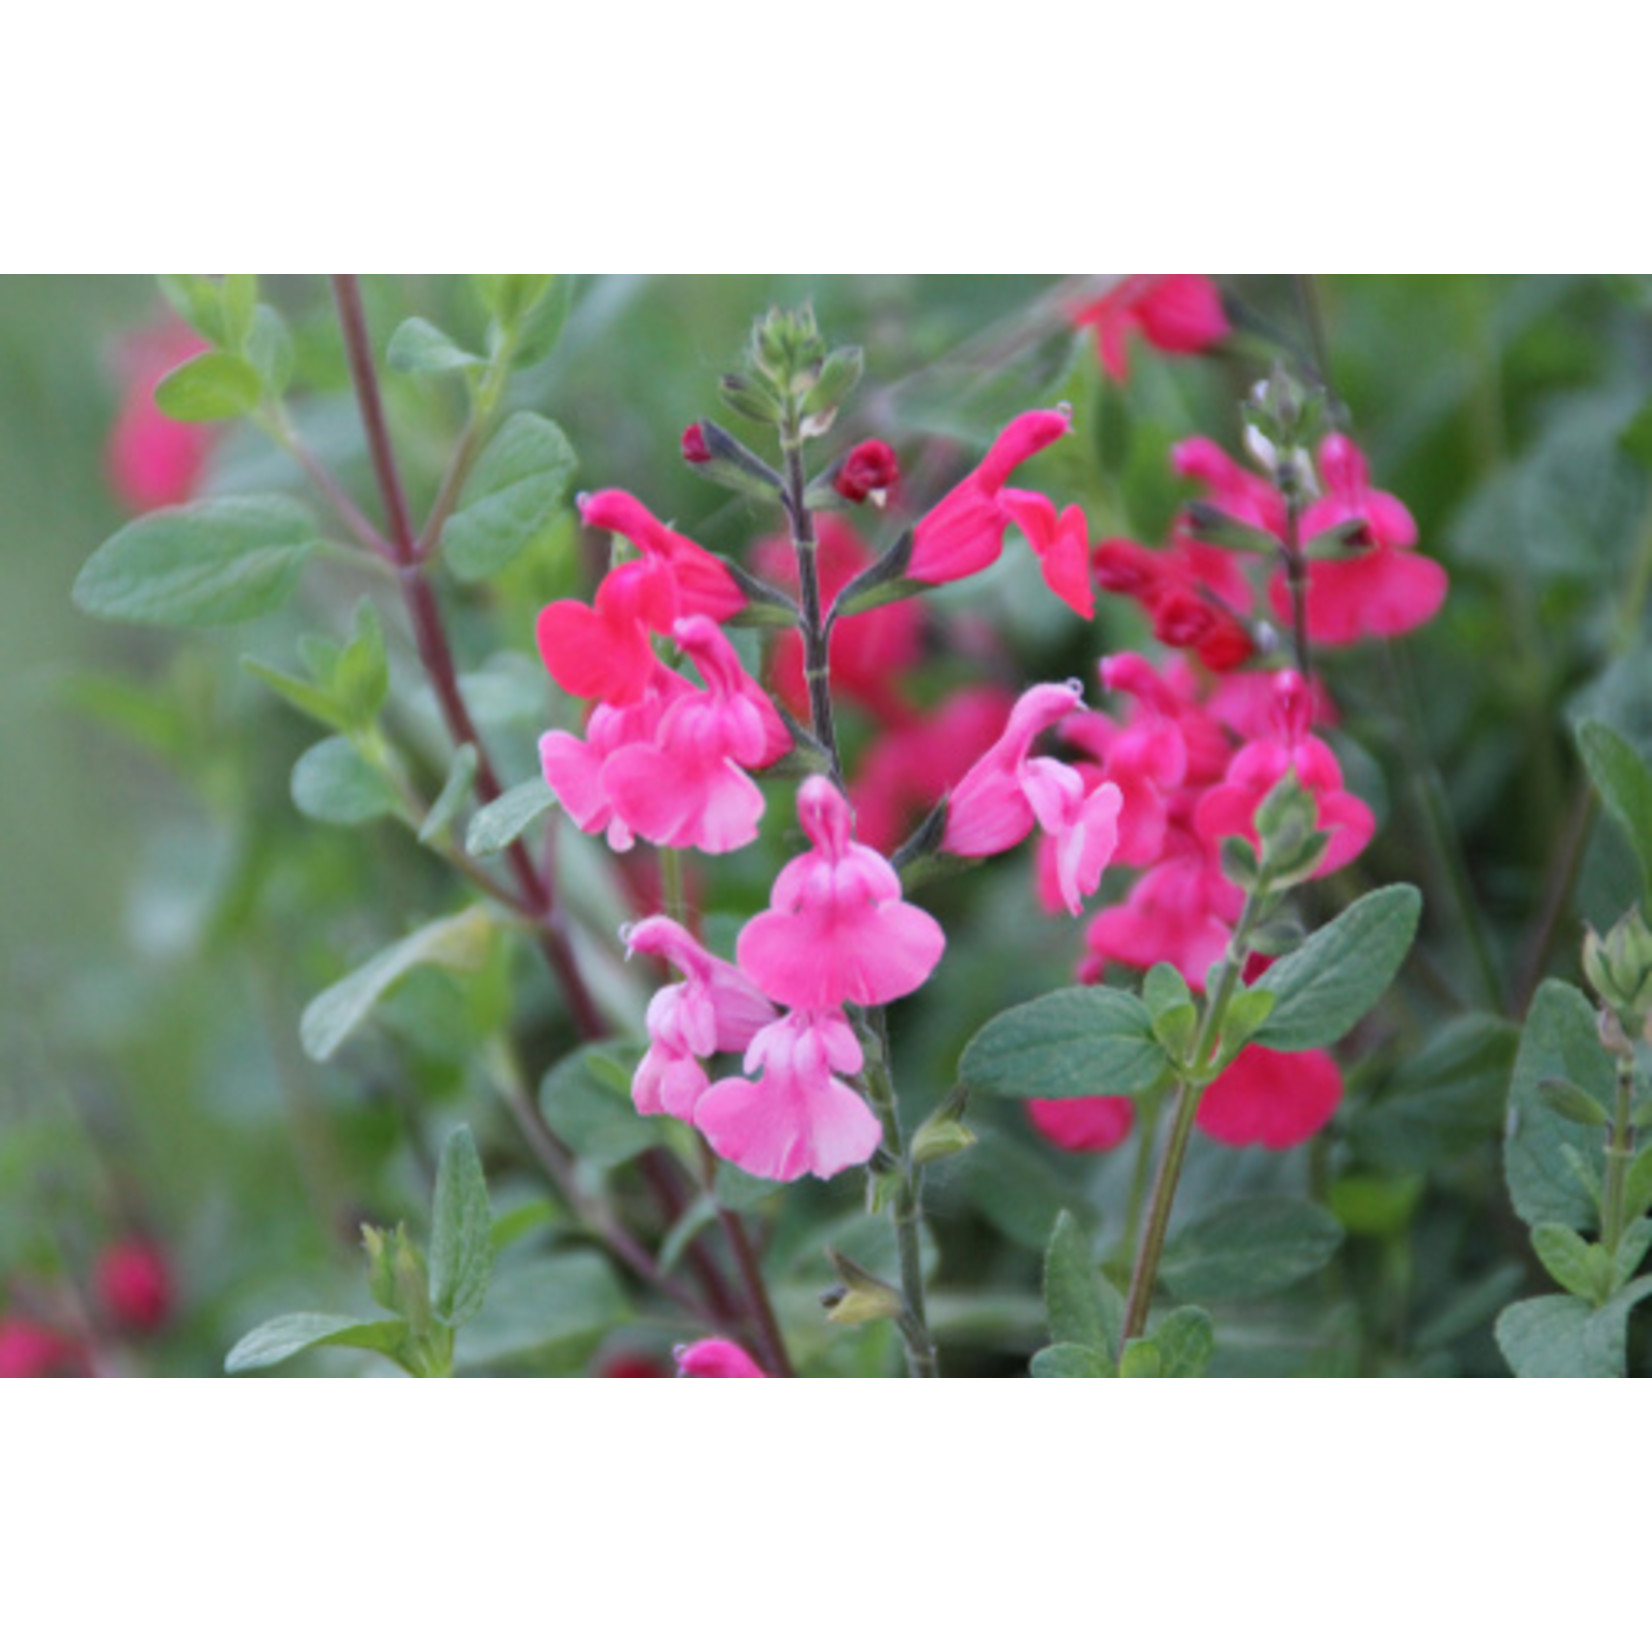 Salvia Pink Profusion - Perennial Sage - 1 GAL